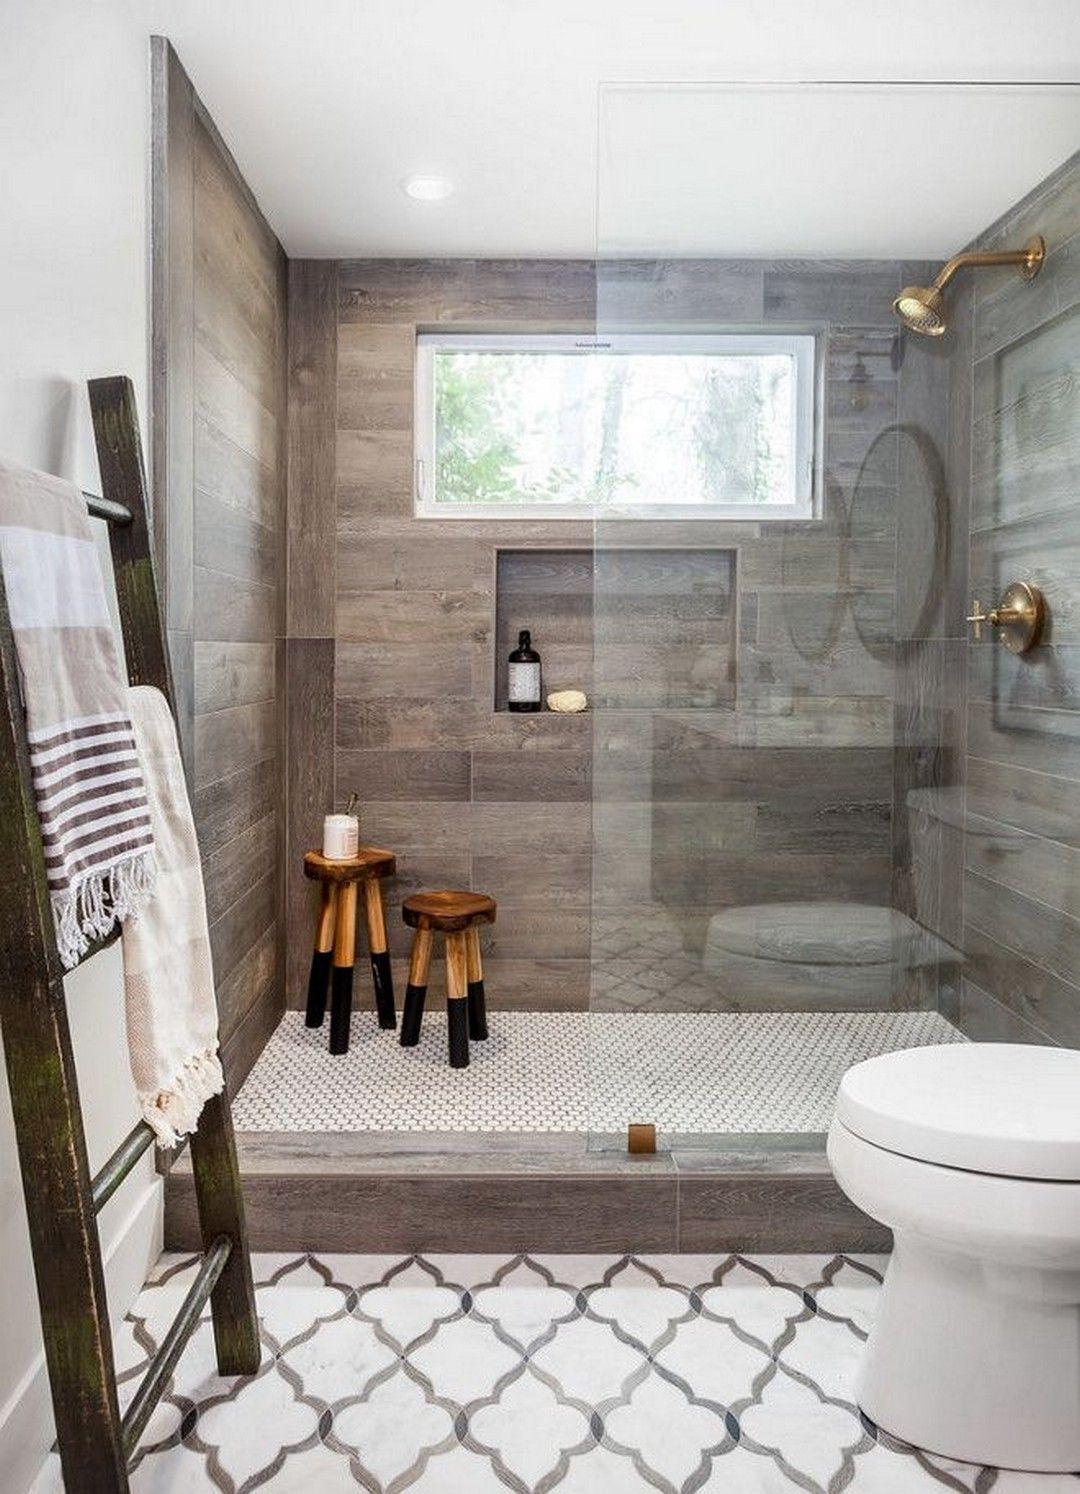 Tile Bathroom Showers Unique 15 Wood Tile Showers for Your Bathroom